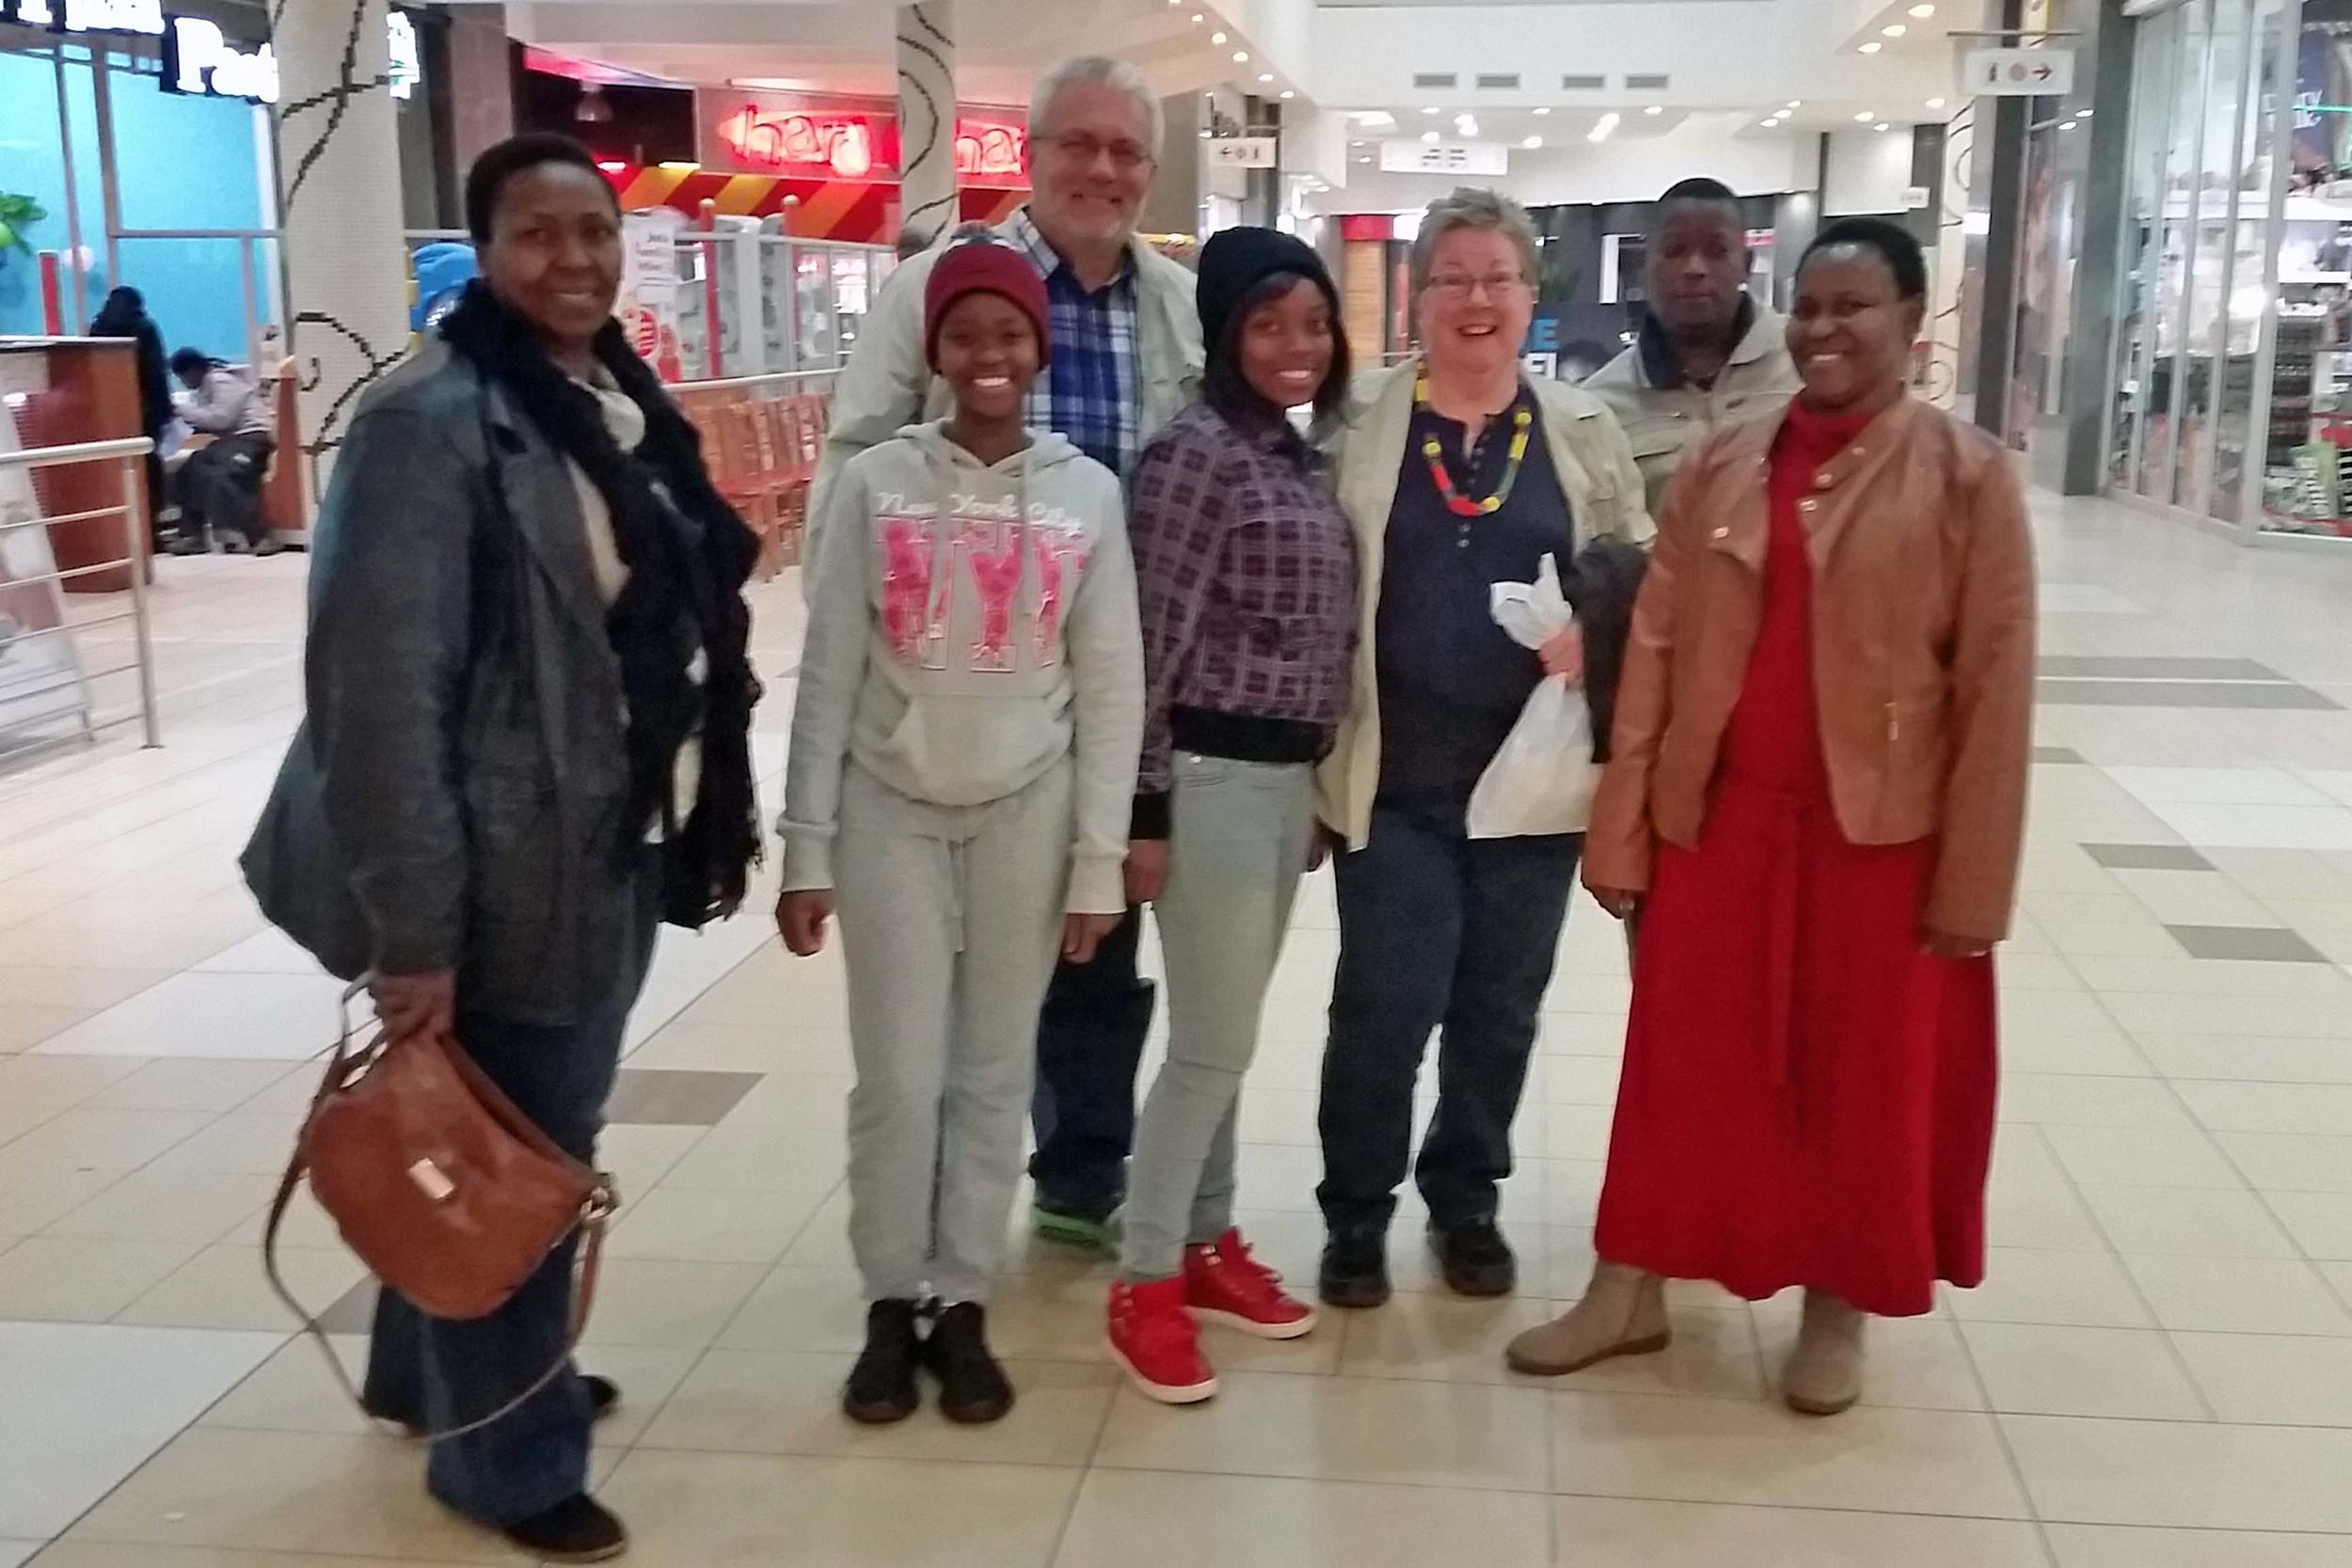 (L to R) Barbara (Kedibone's friend), Boitumelo (daughter), Doug, Kutlwano (neice), Abby, Stephen & Kedibone